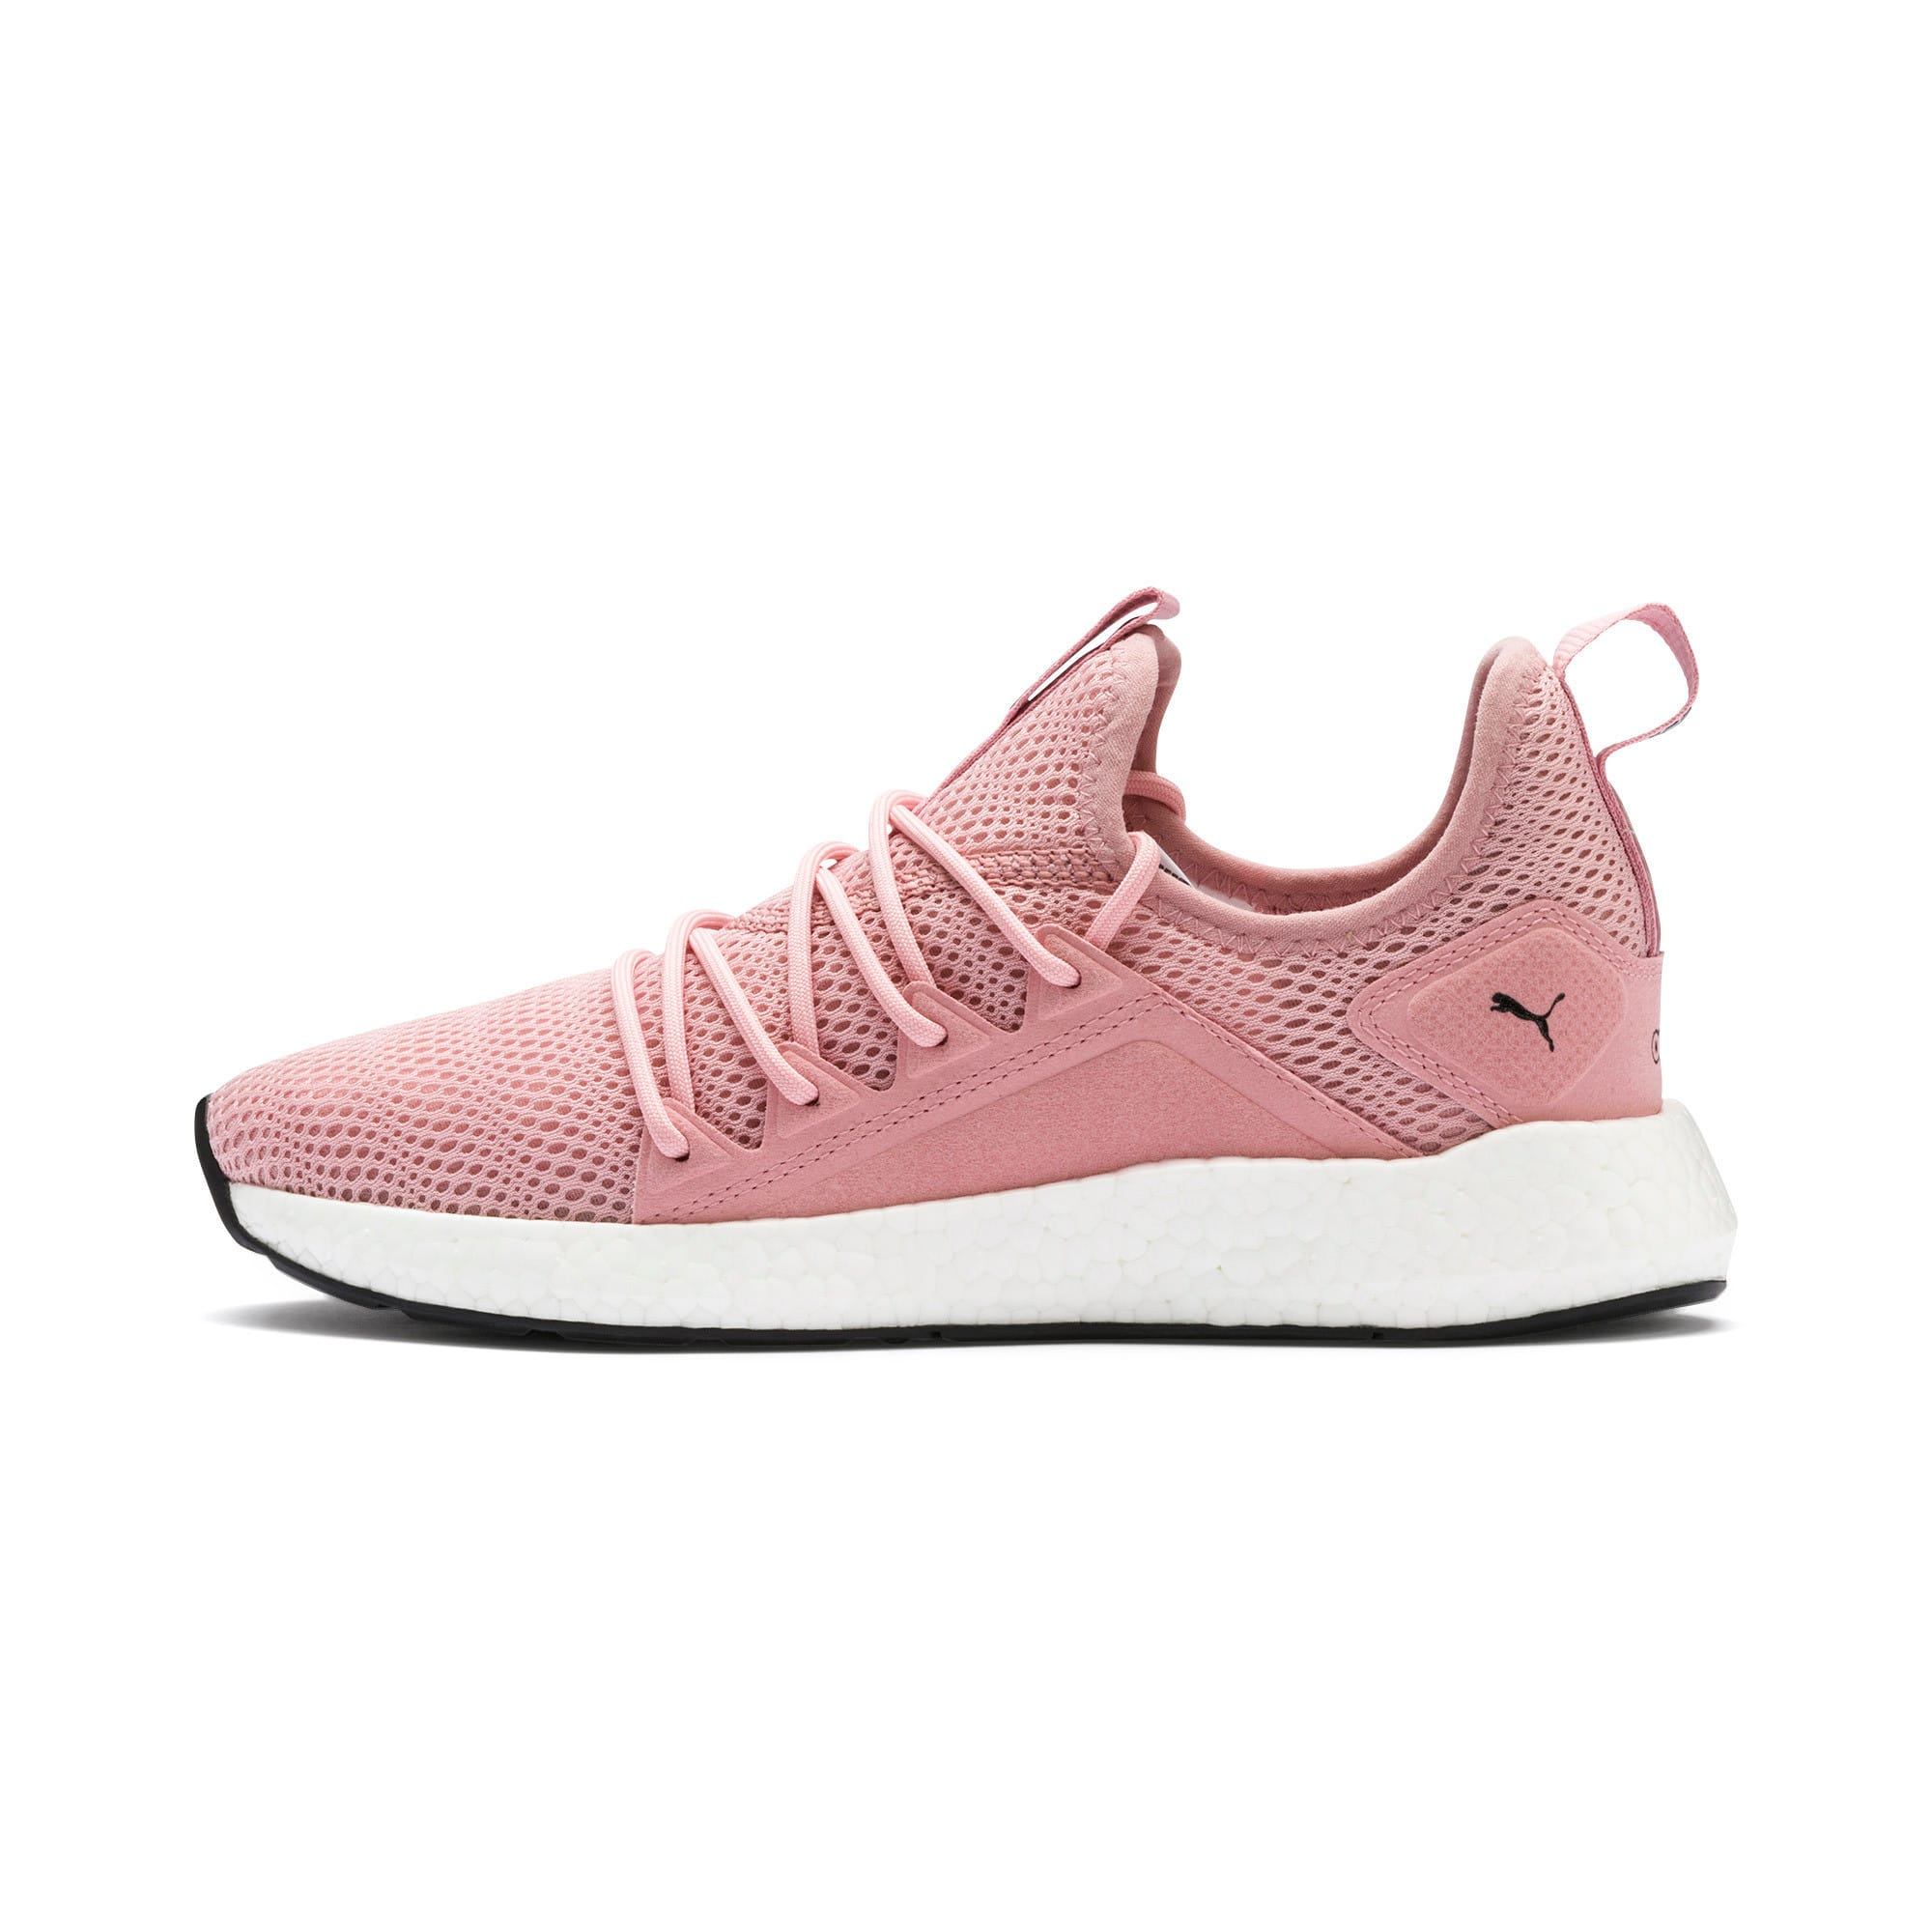 Thumbnail 1 of NRGY Neko Shift Women's Running Shoes, Bridal Rose-Puma White, medium